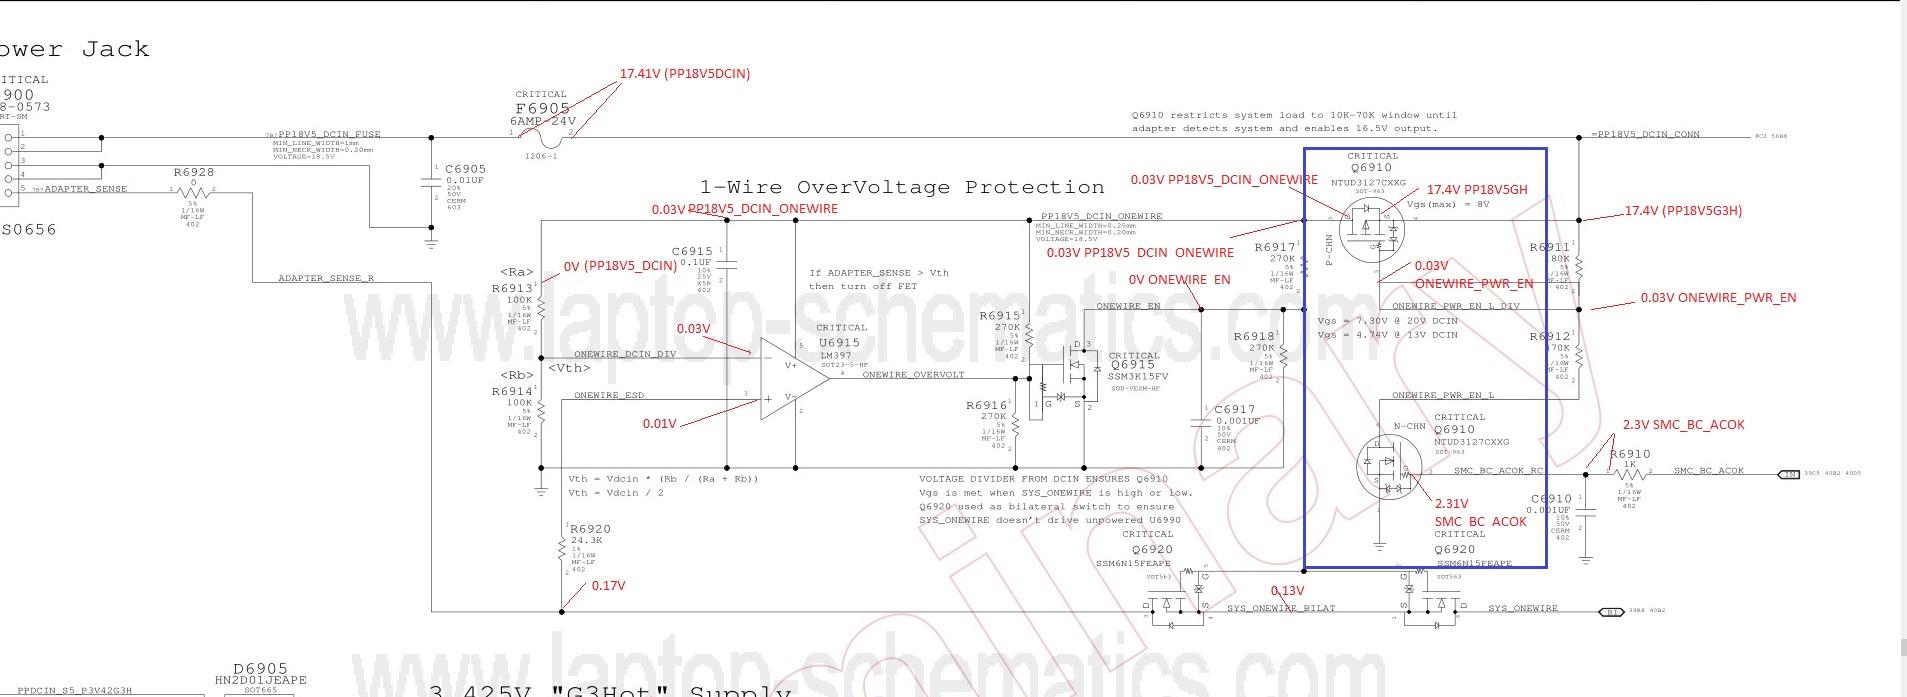 Logic Board Repair Need Help A1278 2008 820 2327 Macrumors Forums Ipad 2 Diagram Onewire2